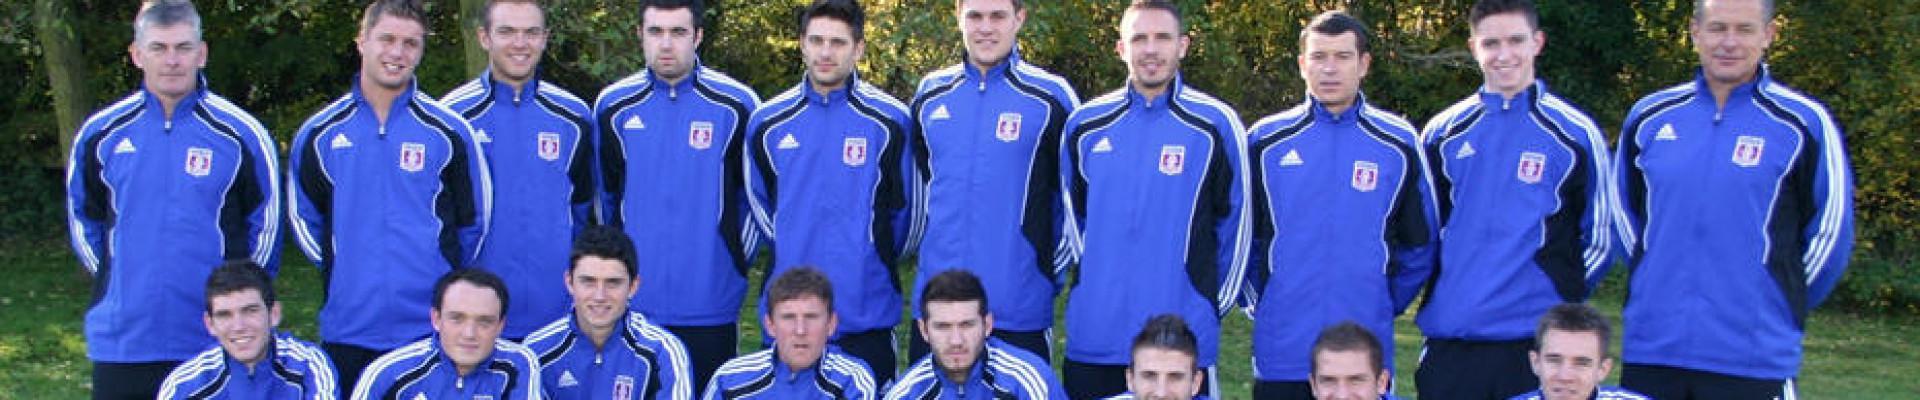 Team Photo 2010/11 Season